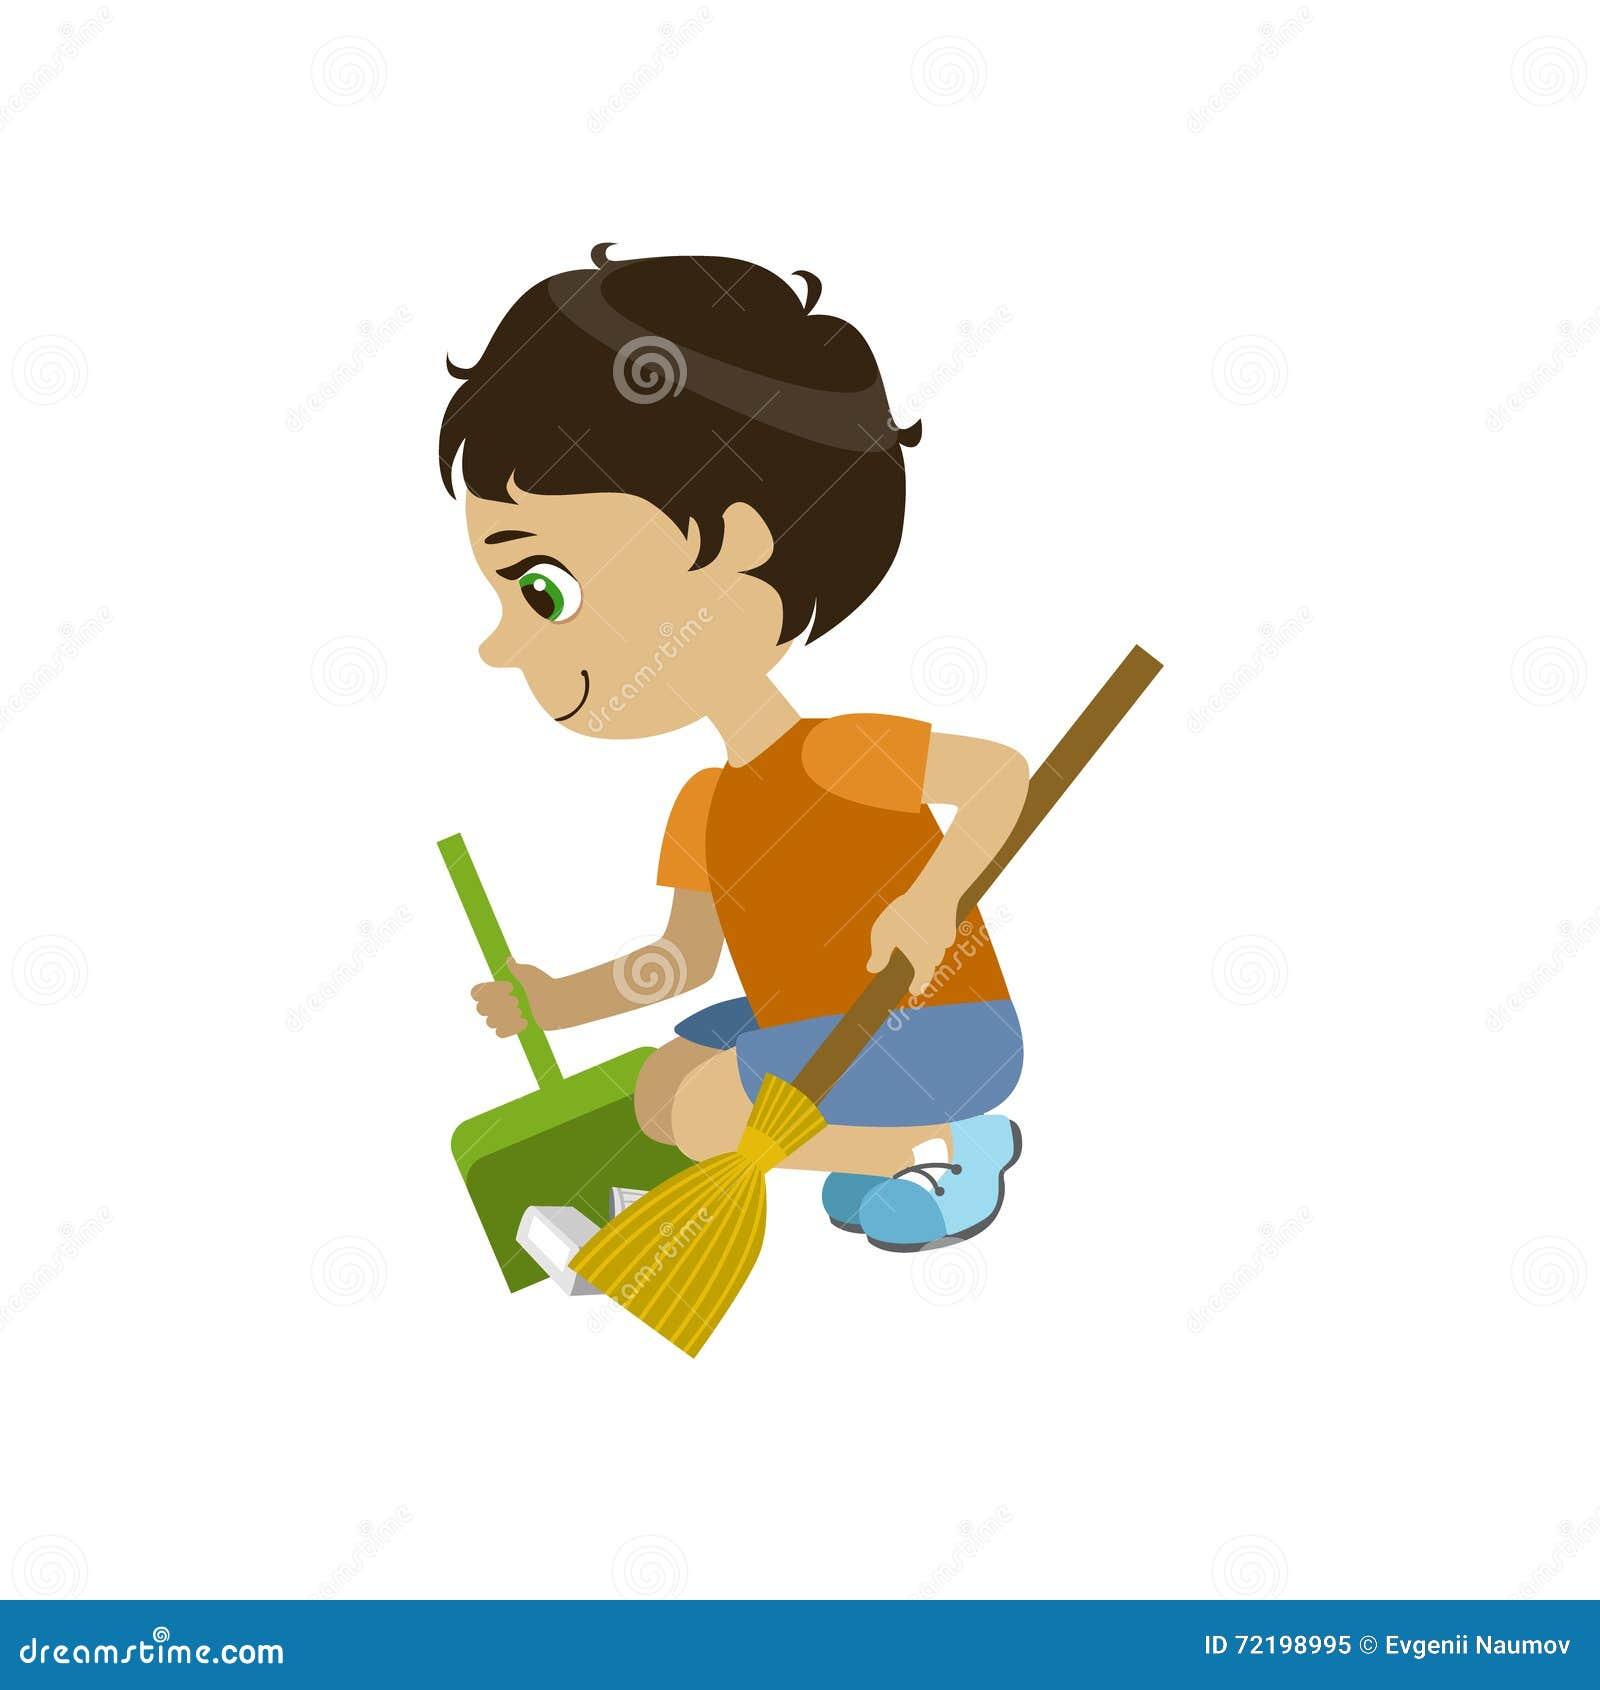 boy doing a garden clean up stock vector illustration of helping design 72198995. Black Bedroom Furniture Sets. Home Design Ideas